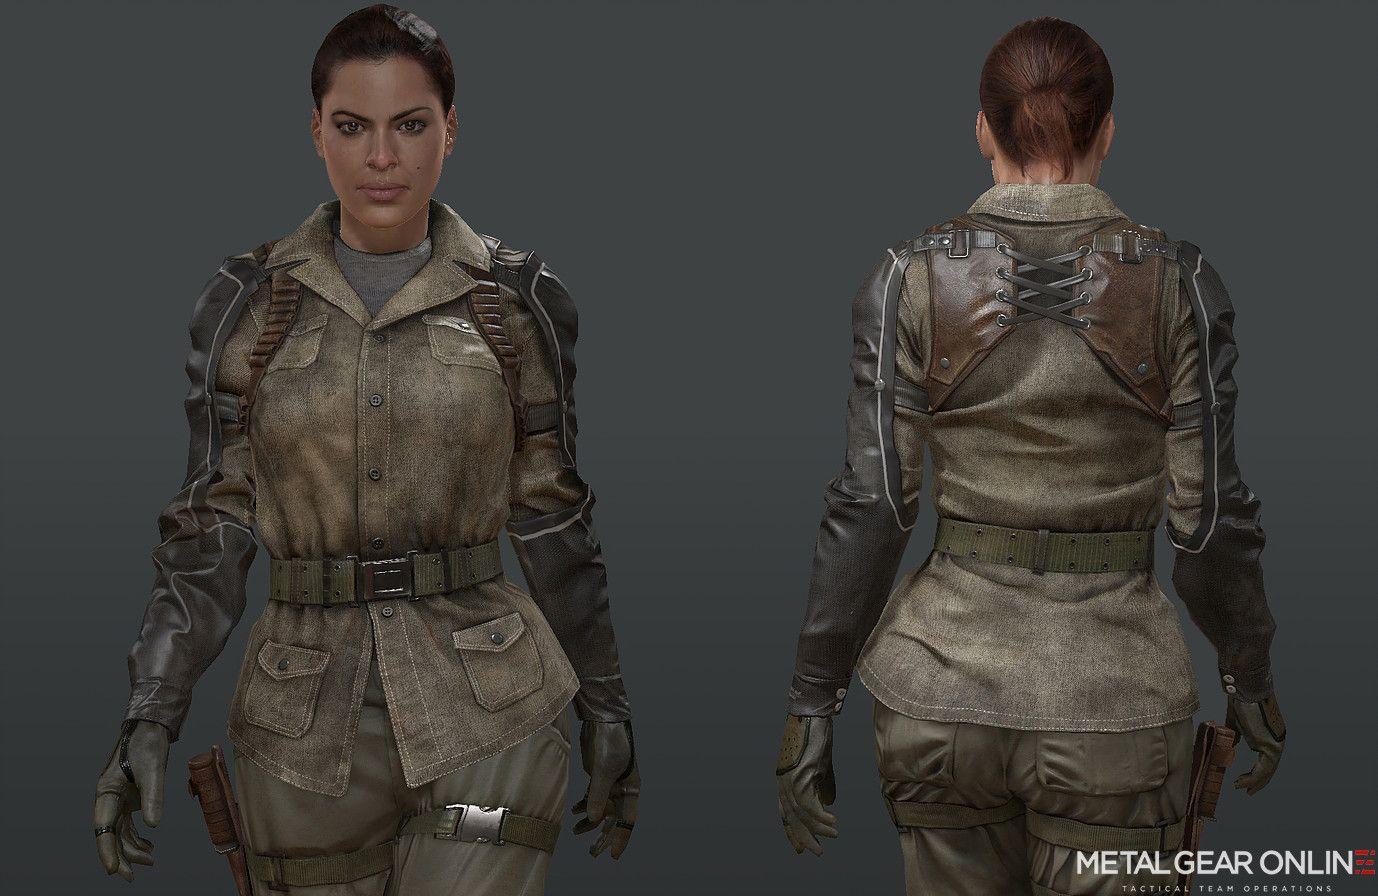 ArtStation - Parasite Soldier / Female Scout, Abraham Valdez